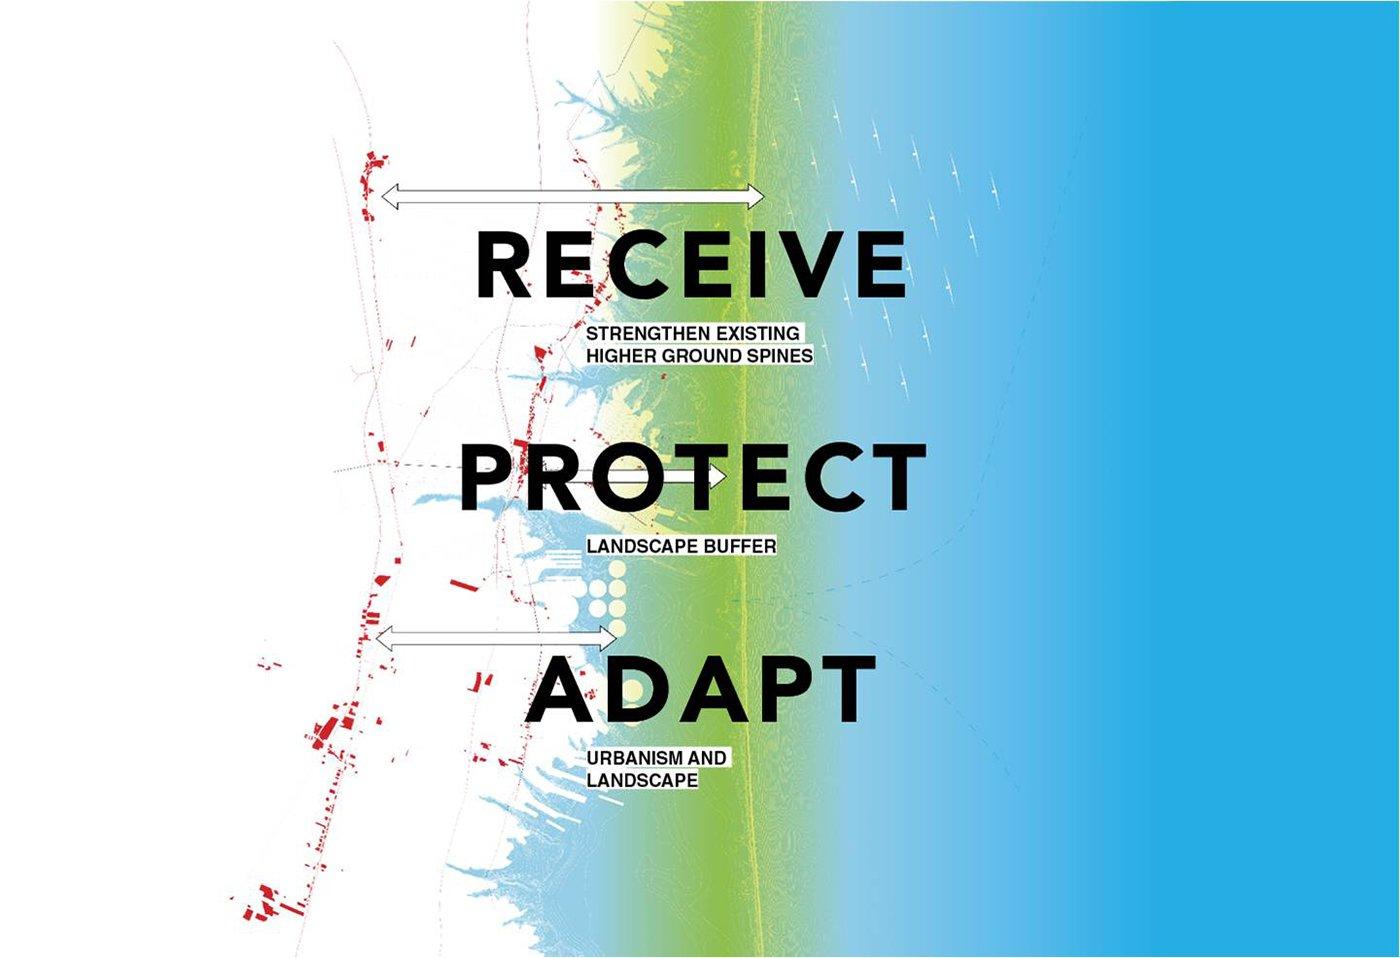 Strategy Diagram: Receive, Protect, Adapt DLANDstudio Architecture and Landscape Architecture + Rafi Segal}